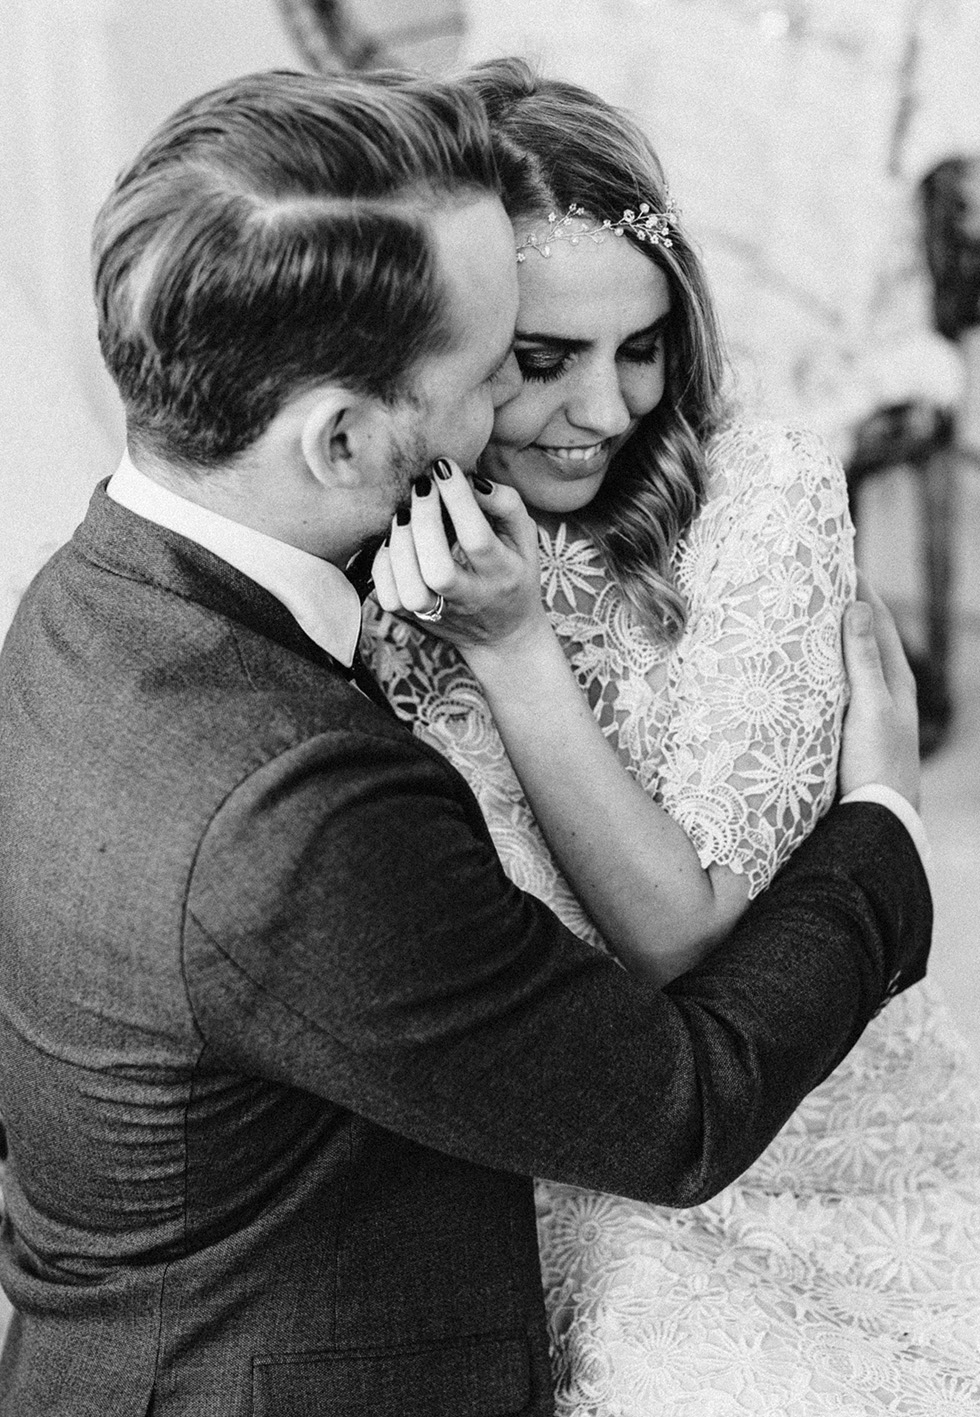 Traumanufaktur_Schloss_Diersford_Bohemian_Wedding_Boho_Hochzeit_Hochzeitsfotograf_071.jpg